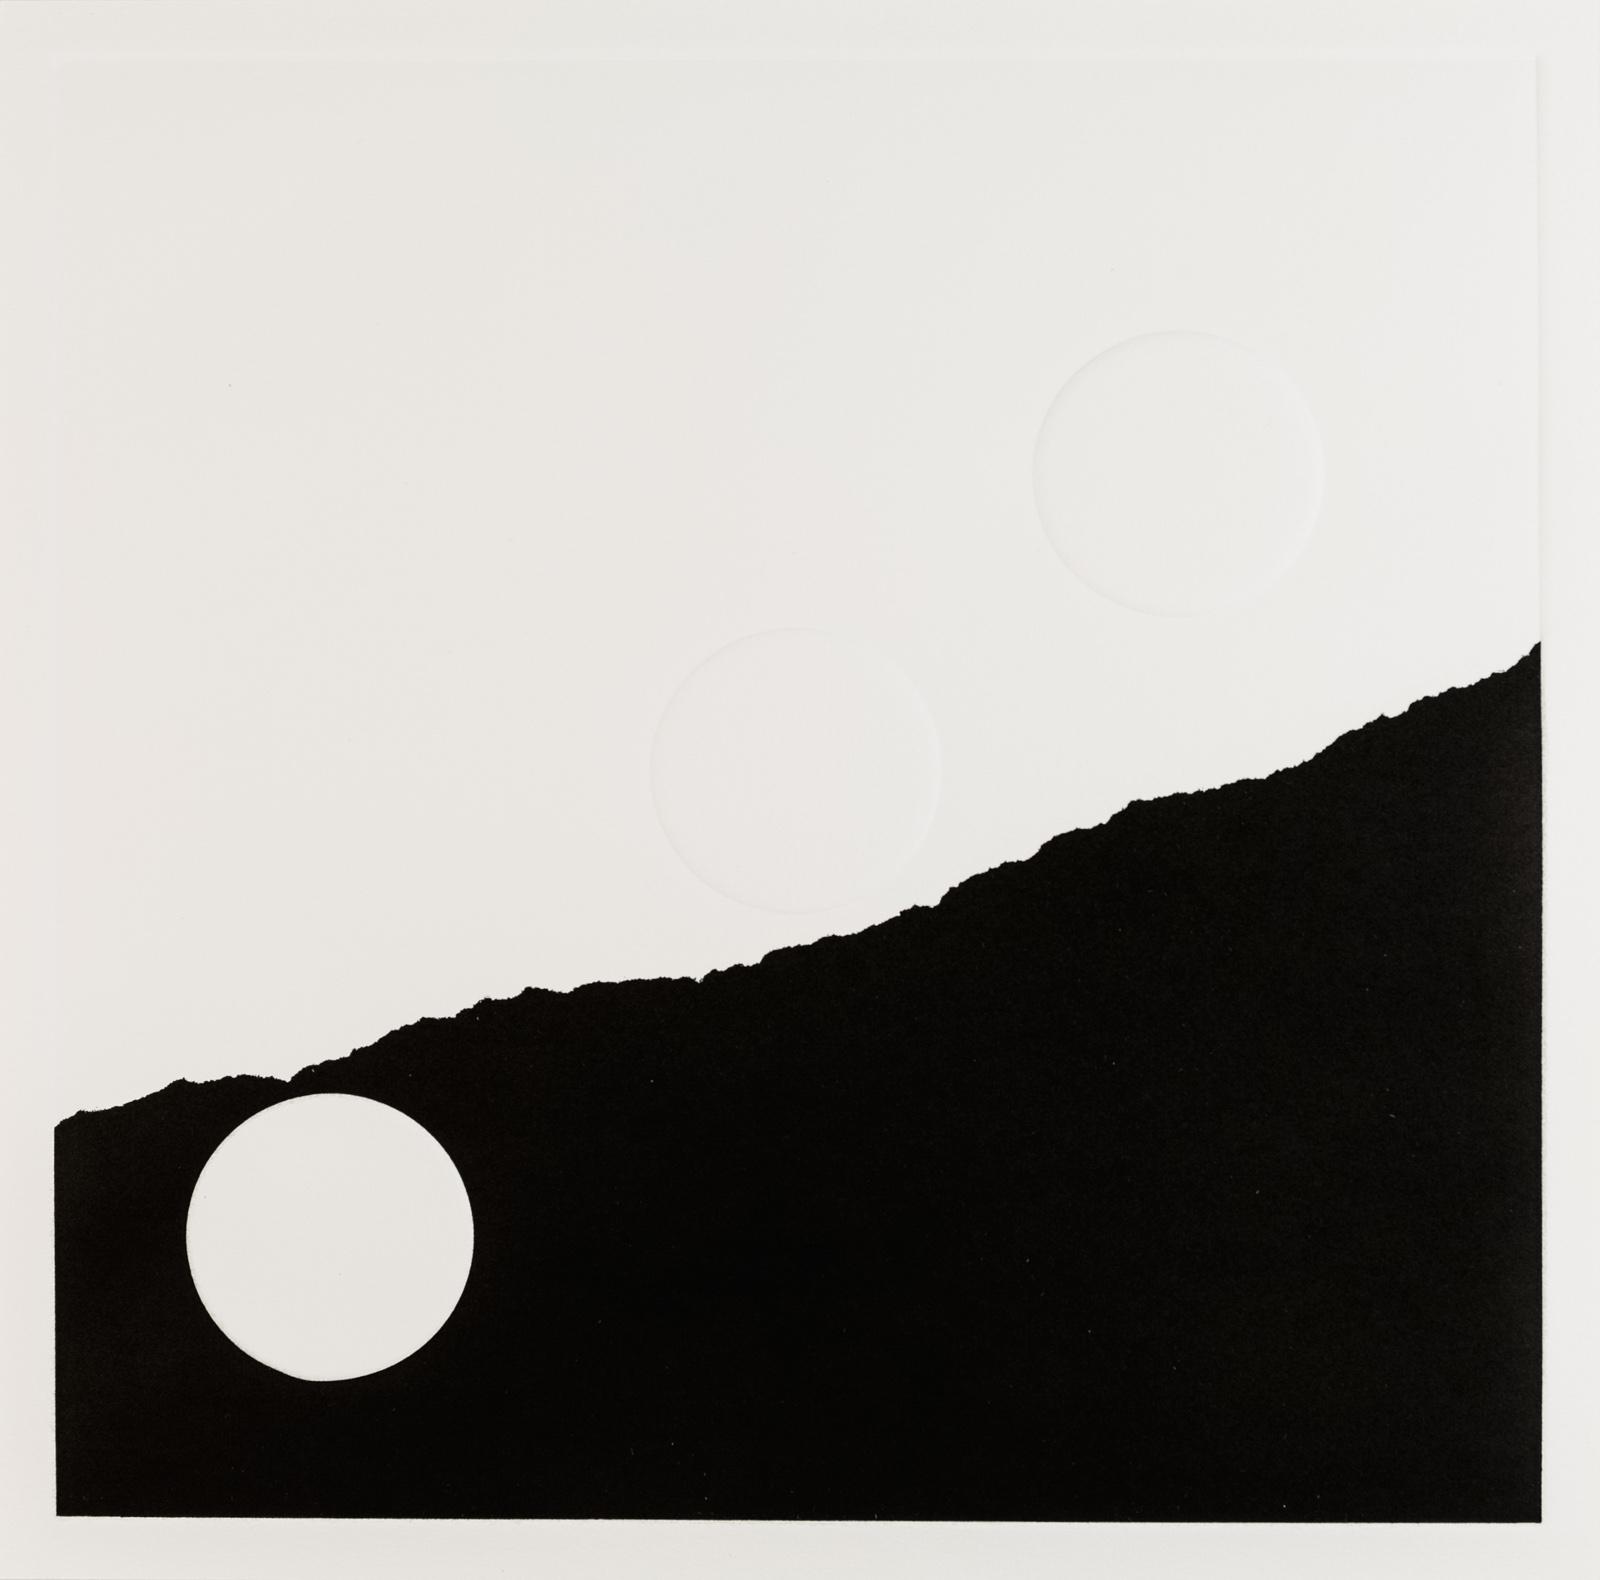 Kristina Matousch, What Lies Ahead 3, 2017, Unique print from an edition of 8, 31,5 x 31,5 cm